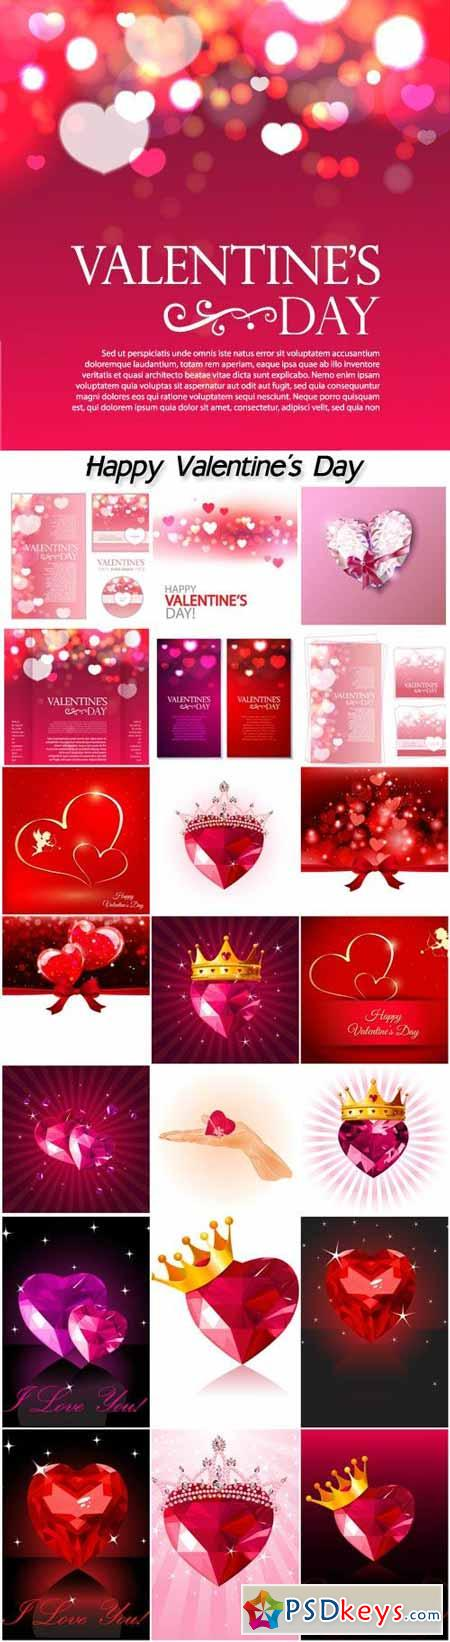 Valentine's Day, cupids, hearts, teddy bears